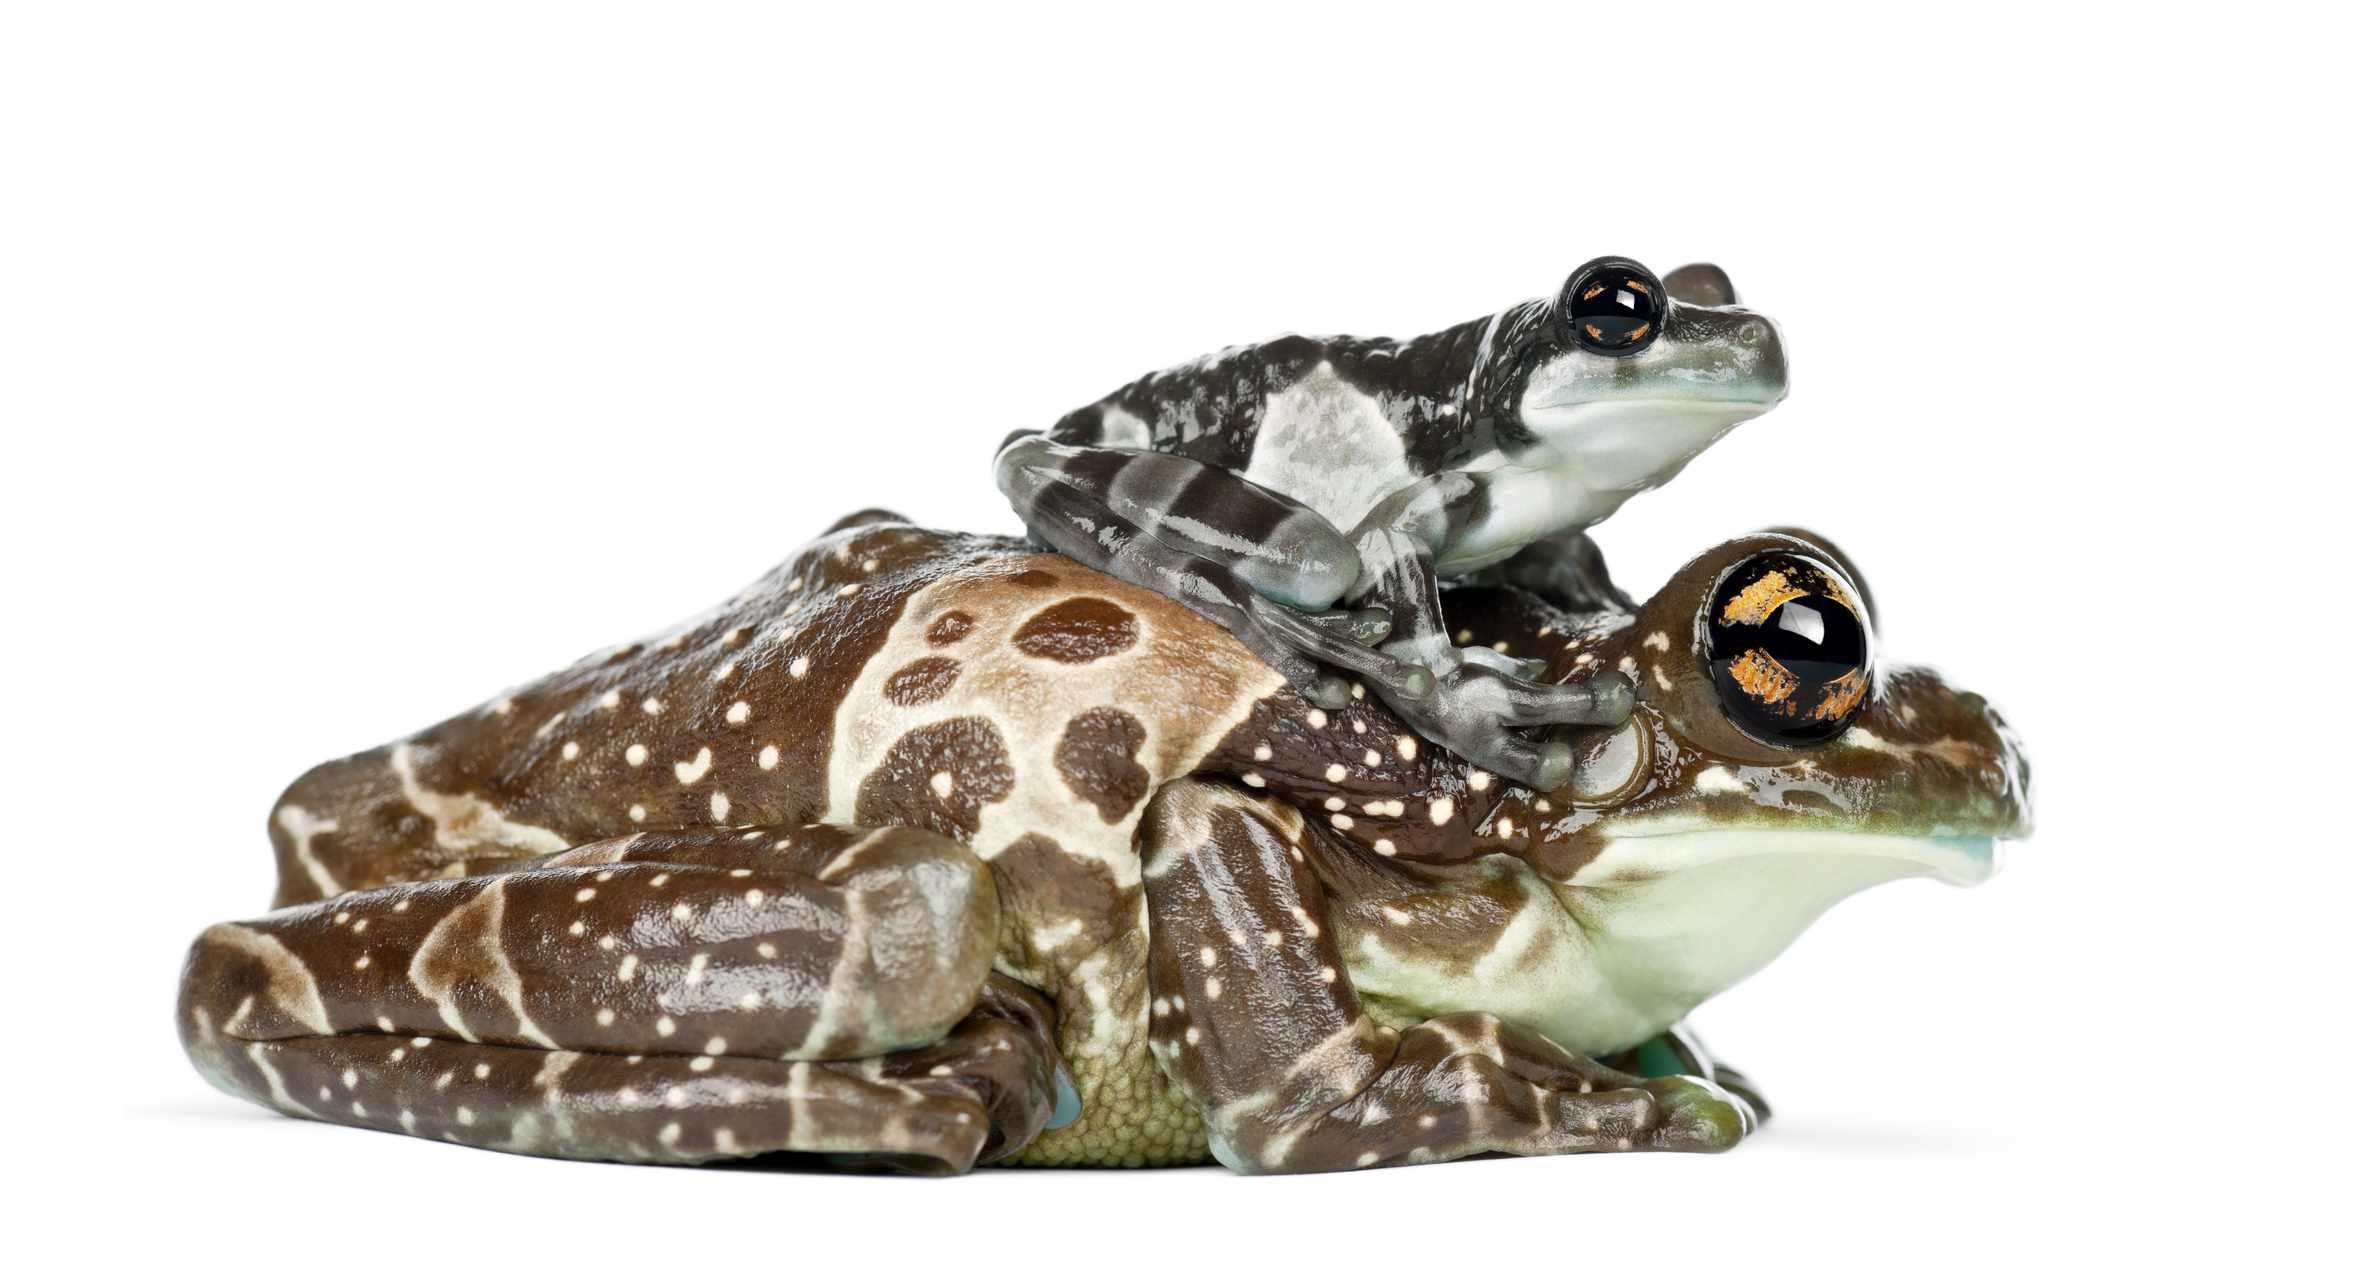 Amazon milk frog adult and young